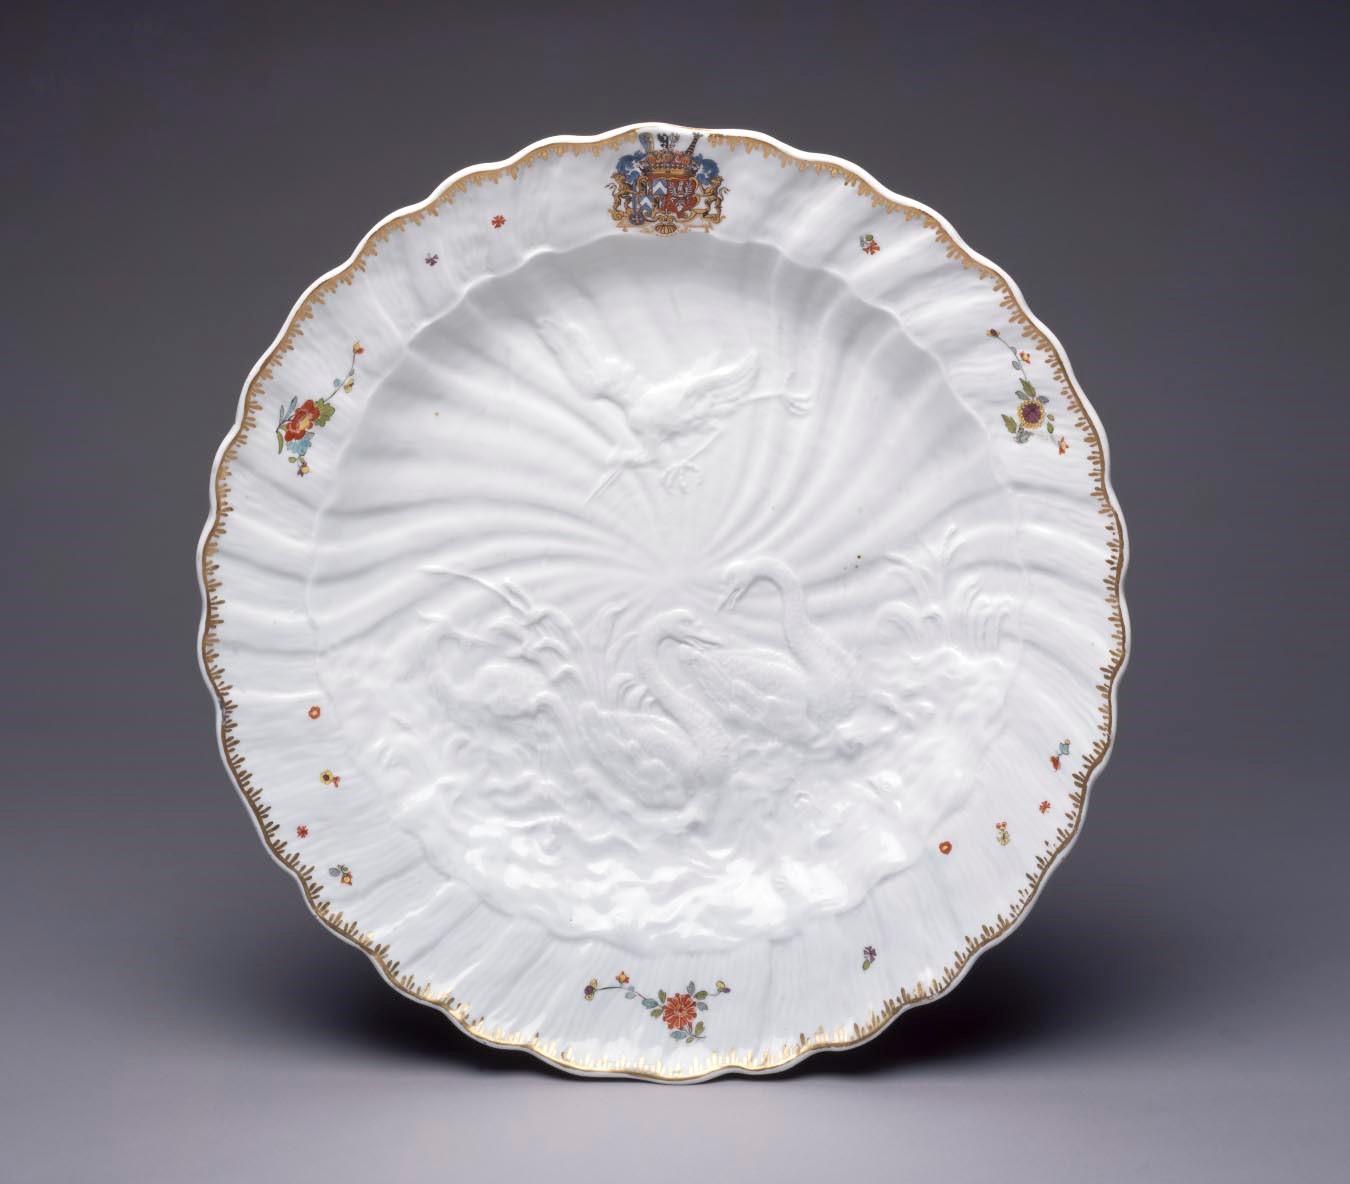 Dating meissen porcelain